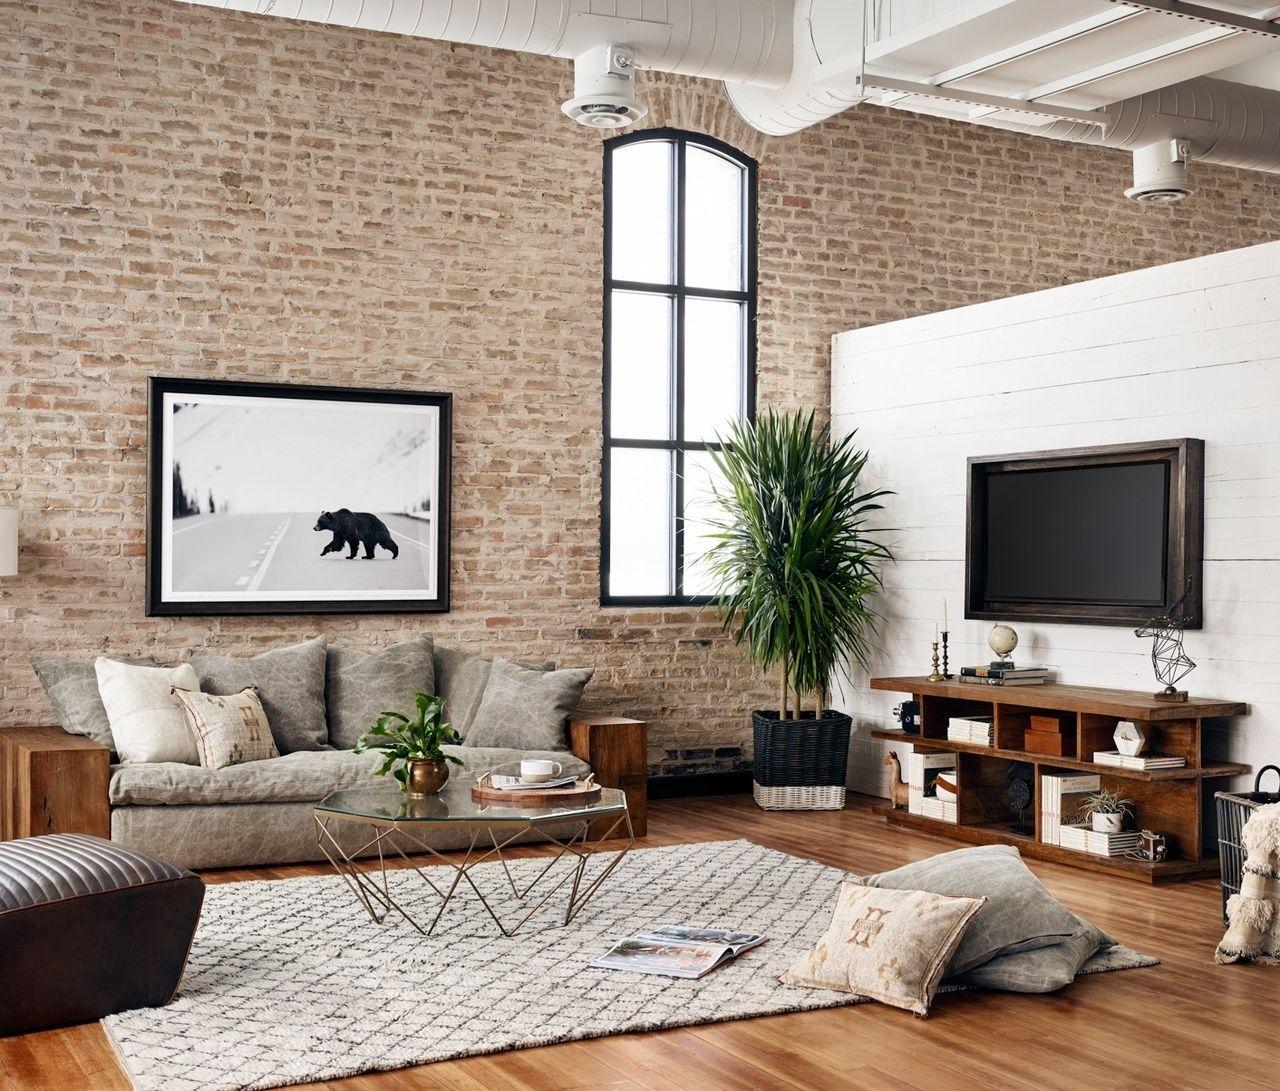 peroba wood furniture. Tylor Reclaimed Peroba Wood TV Media Console (https://www.zinhome. Furniture L